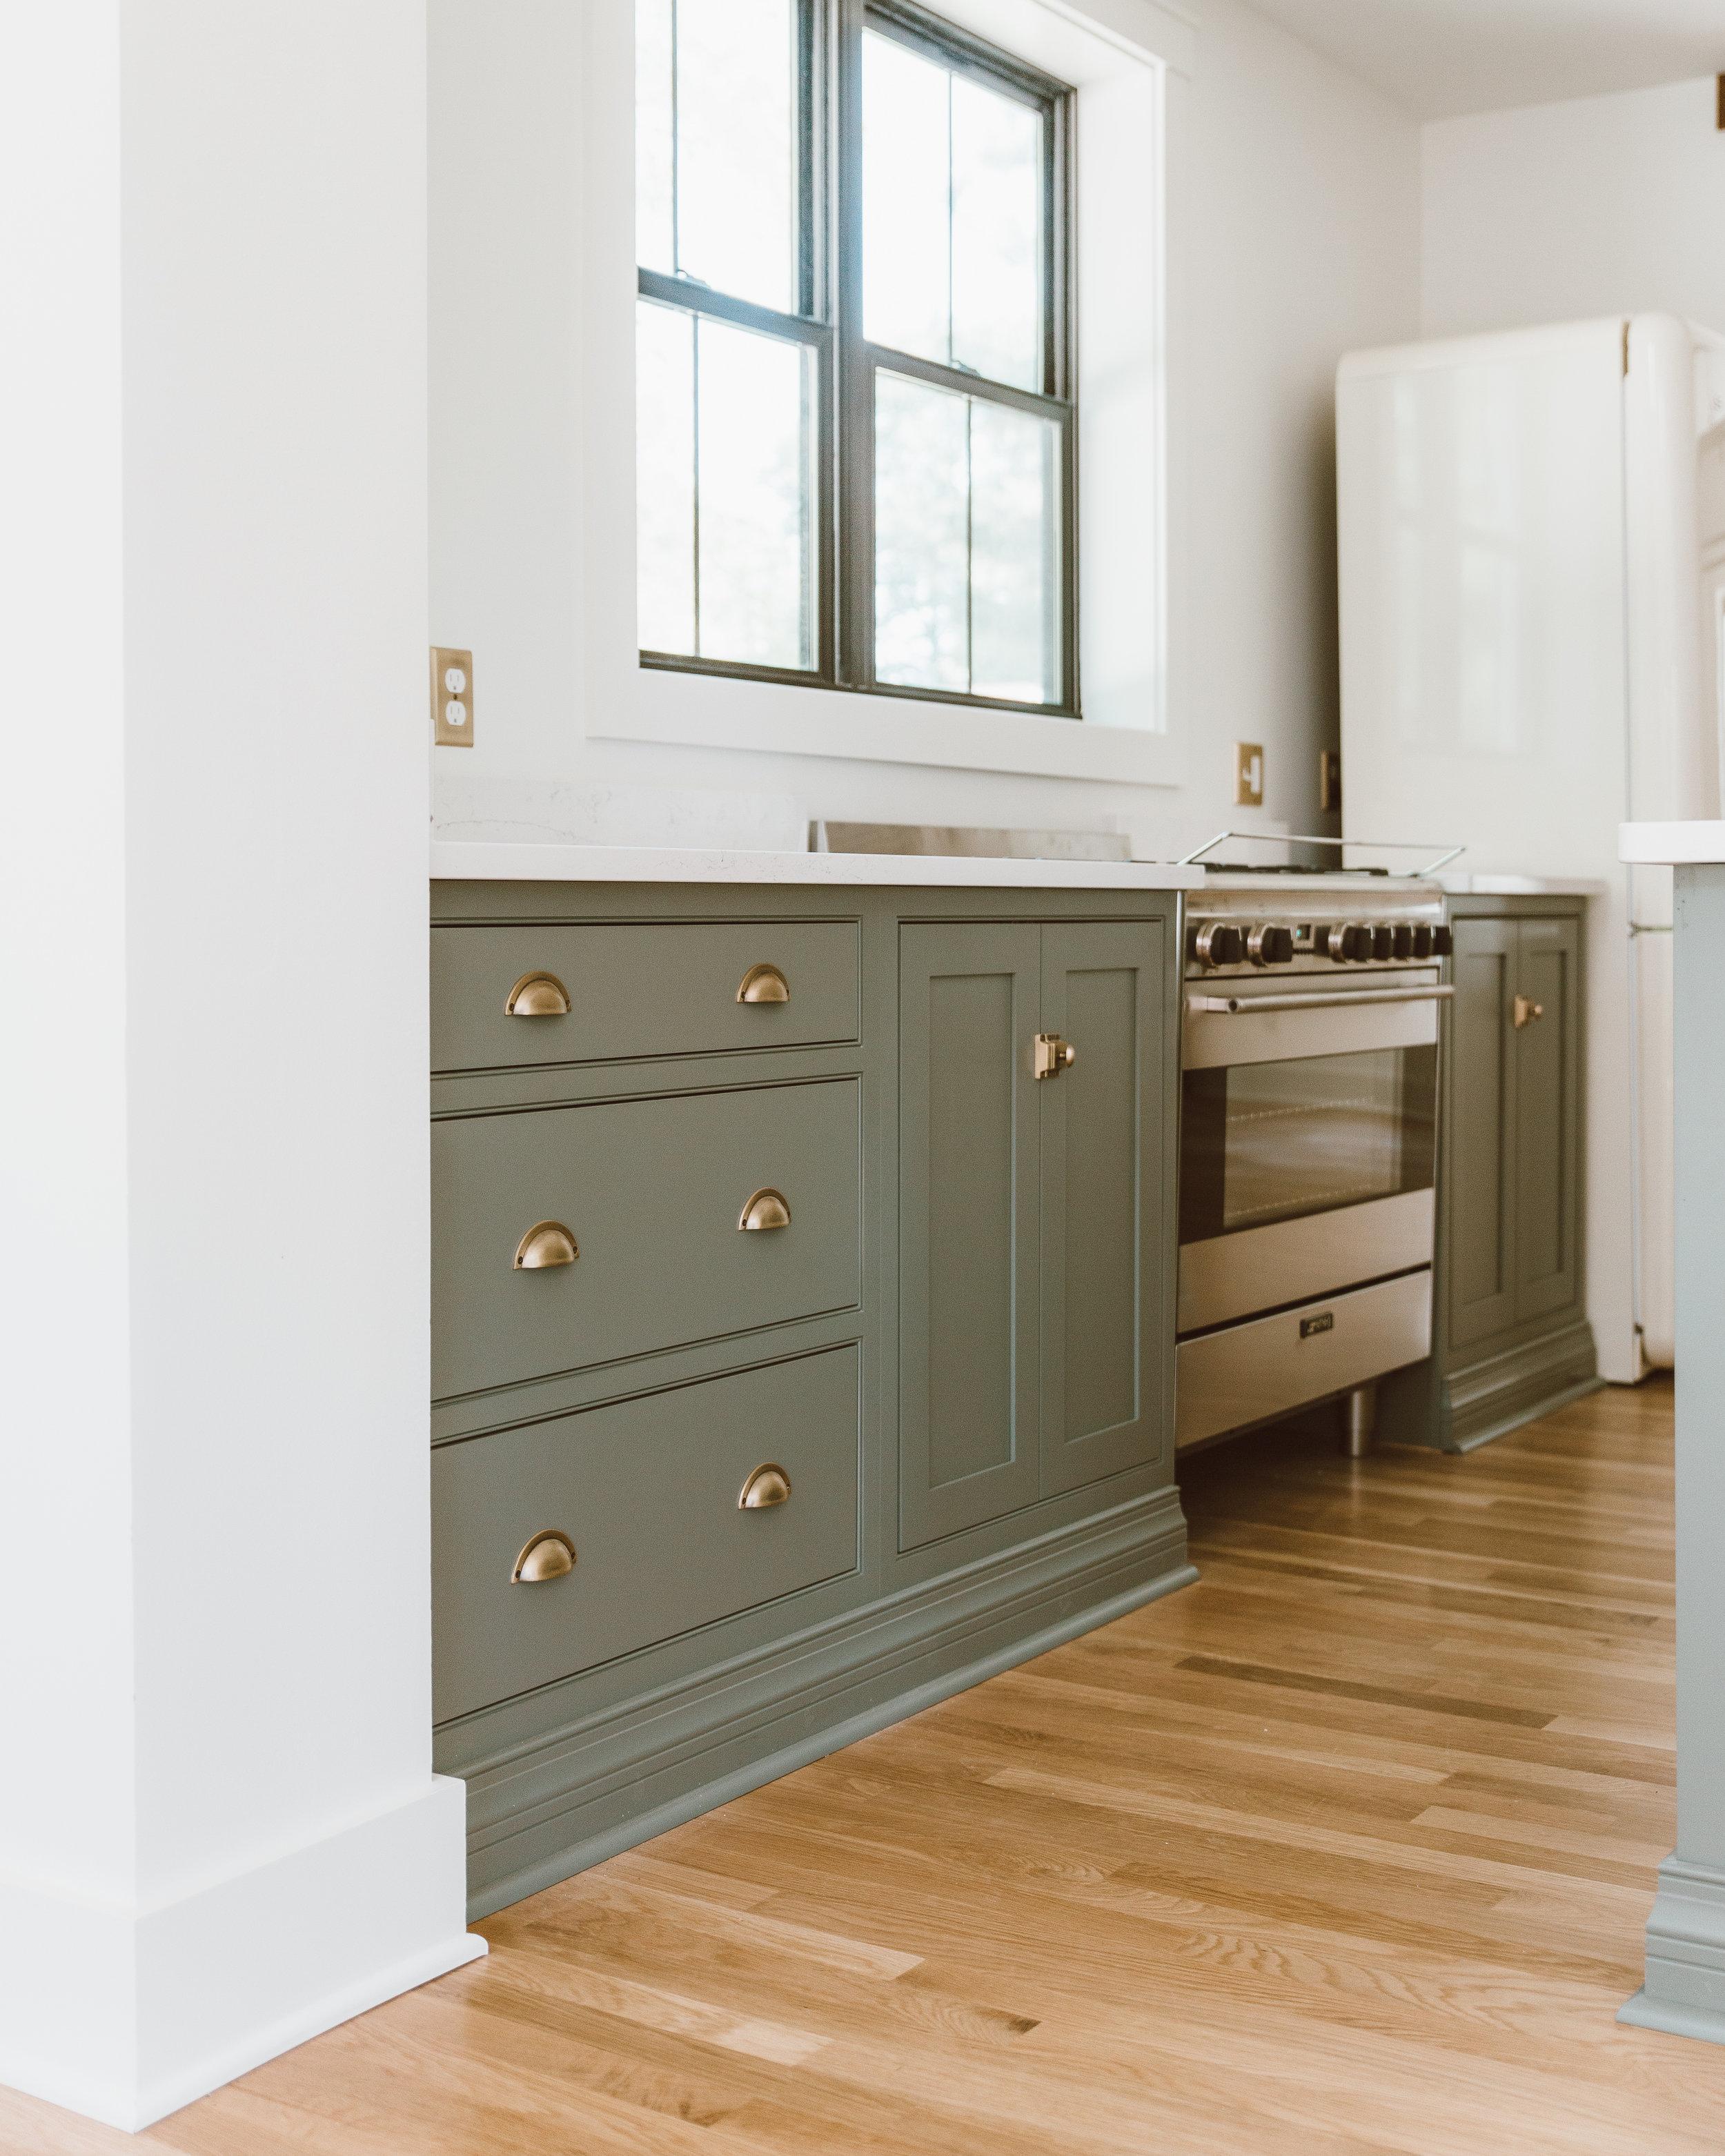 forthehome-nostalgic-warehouse-kitchen-cabinet-hardware00.jpg